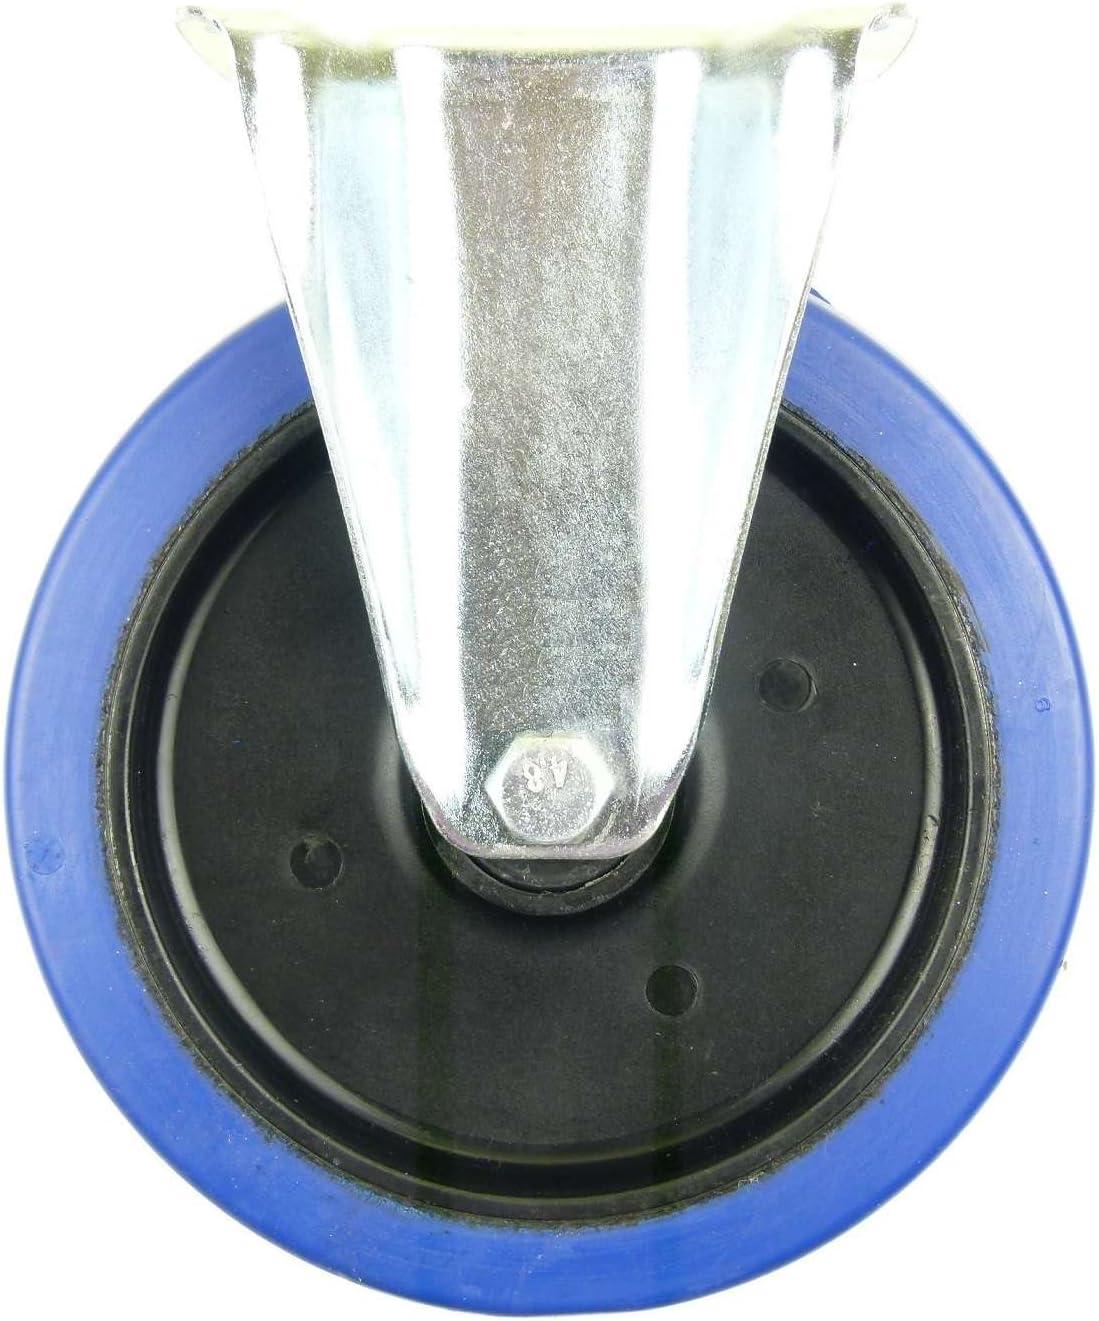 Rad 4 St/ück 200mm Blue Wheels Lenkrollen mit Feststellbremse//Bremse FS Transportrollen Elastik Blau 350kg INDUSTRIEQALIT/ÄT 4 x Brems